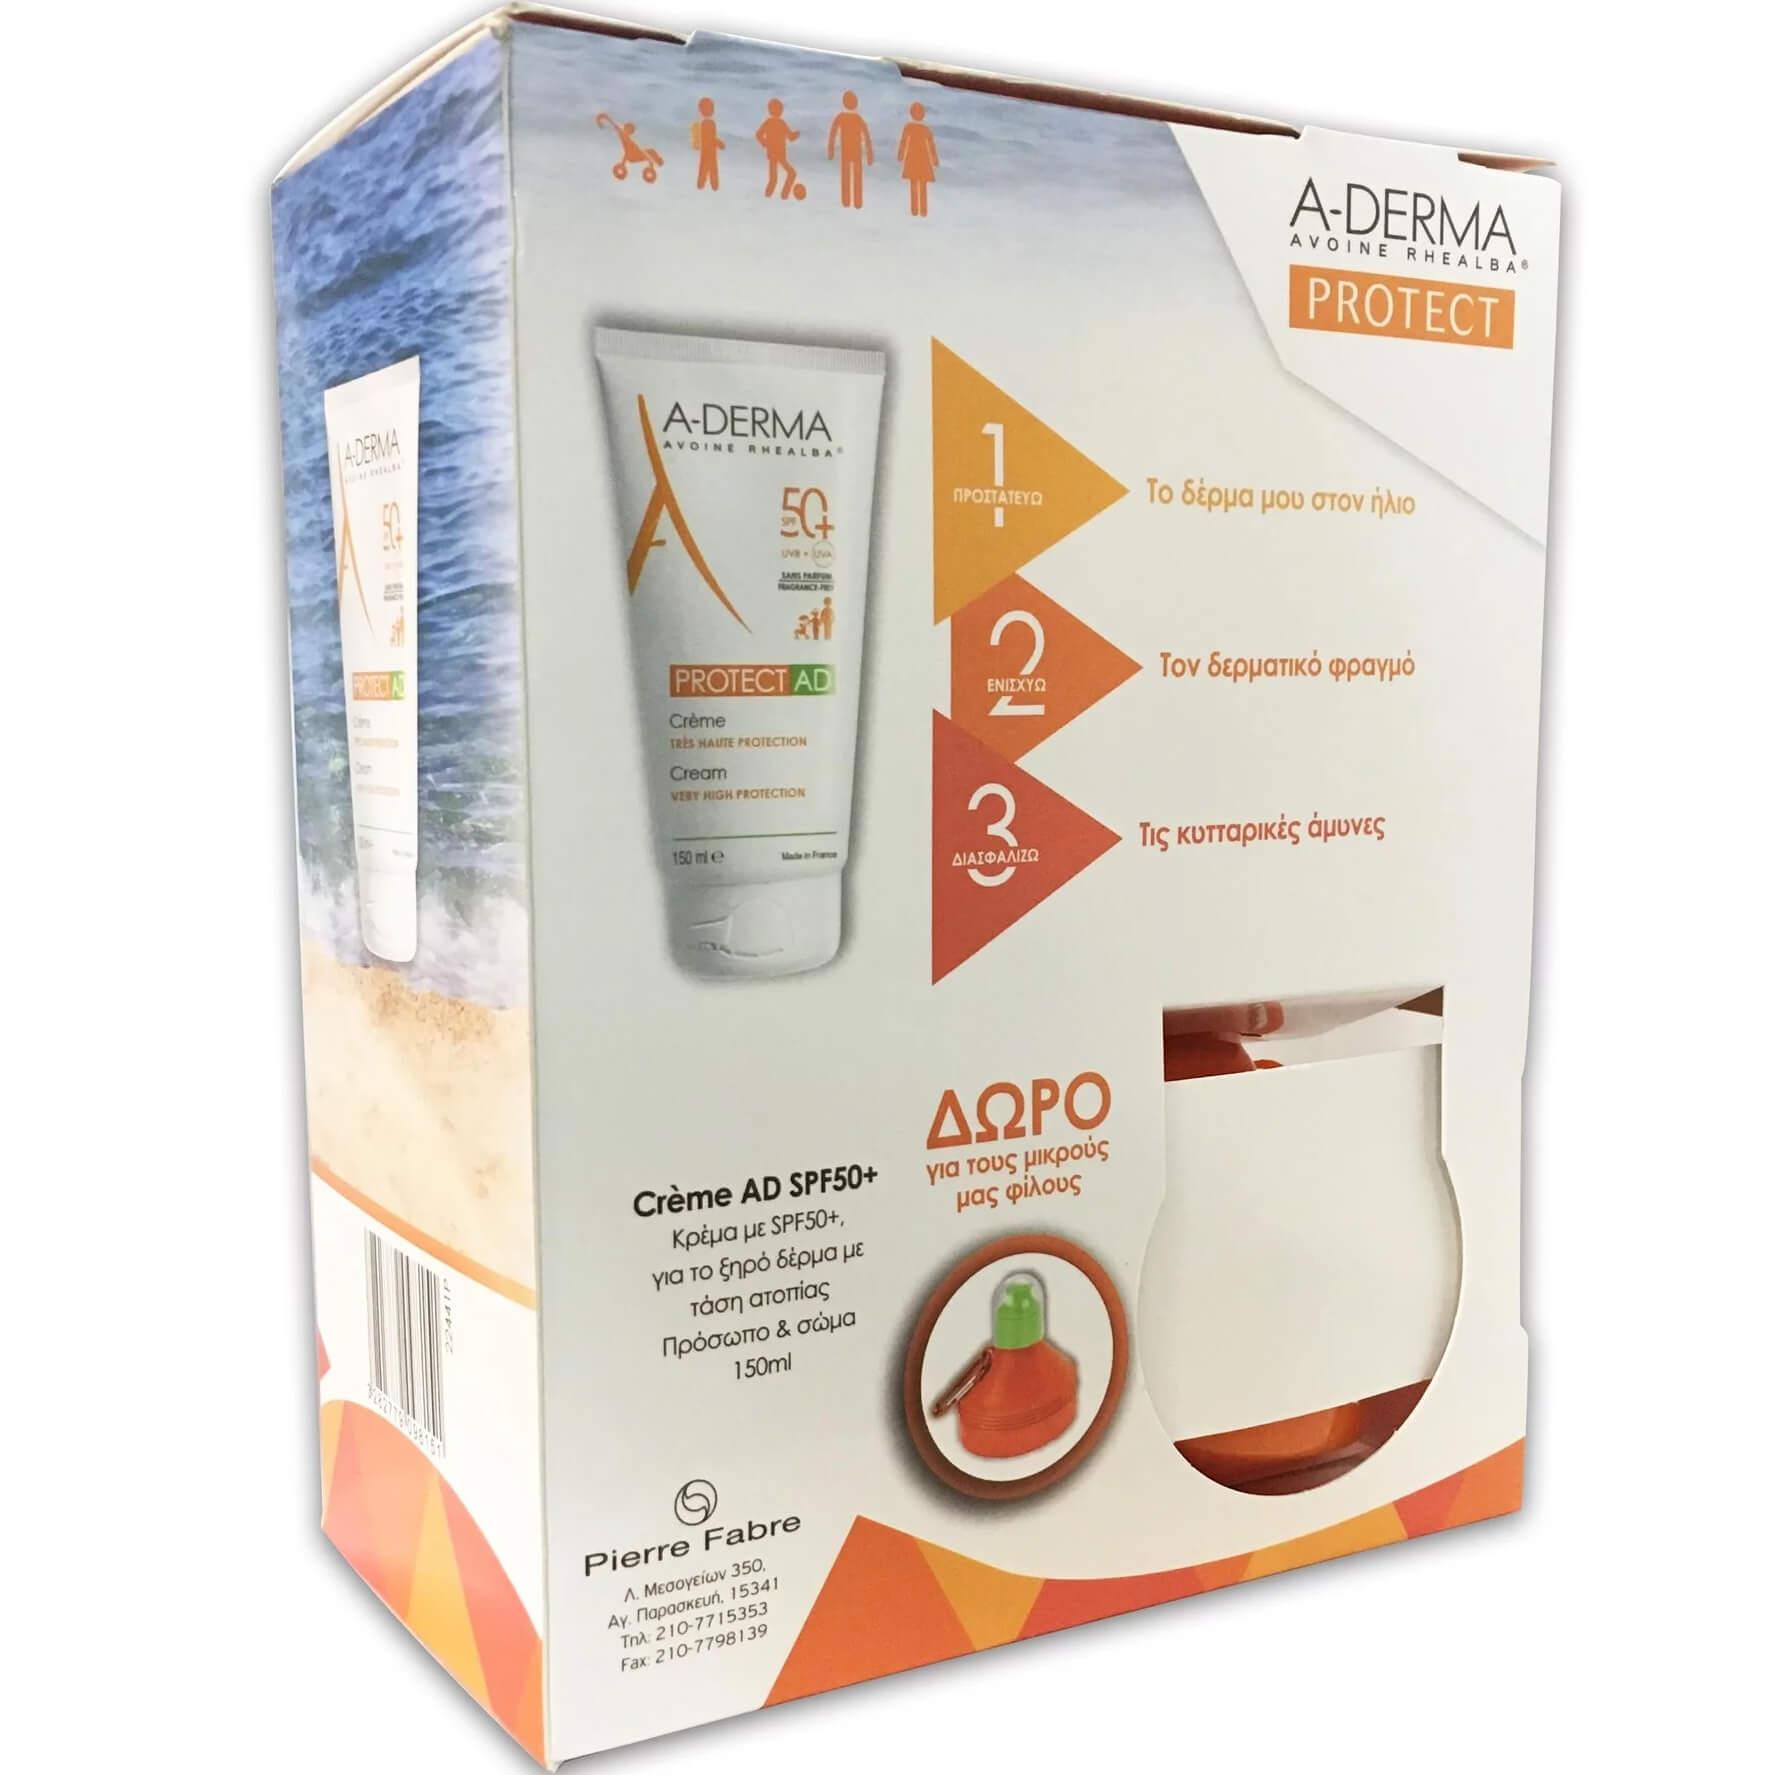 A-Derma Protect AD Creme Spf50+ Αντηλιακή Κρέμα Προσώπου Σώματος Πολύ Υψηλής Προστασίας για Ξηρό Ατοπικό Δέρμα 150ml & Gift Kid